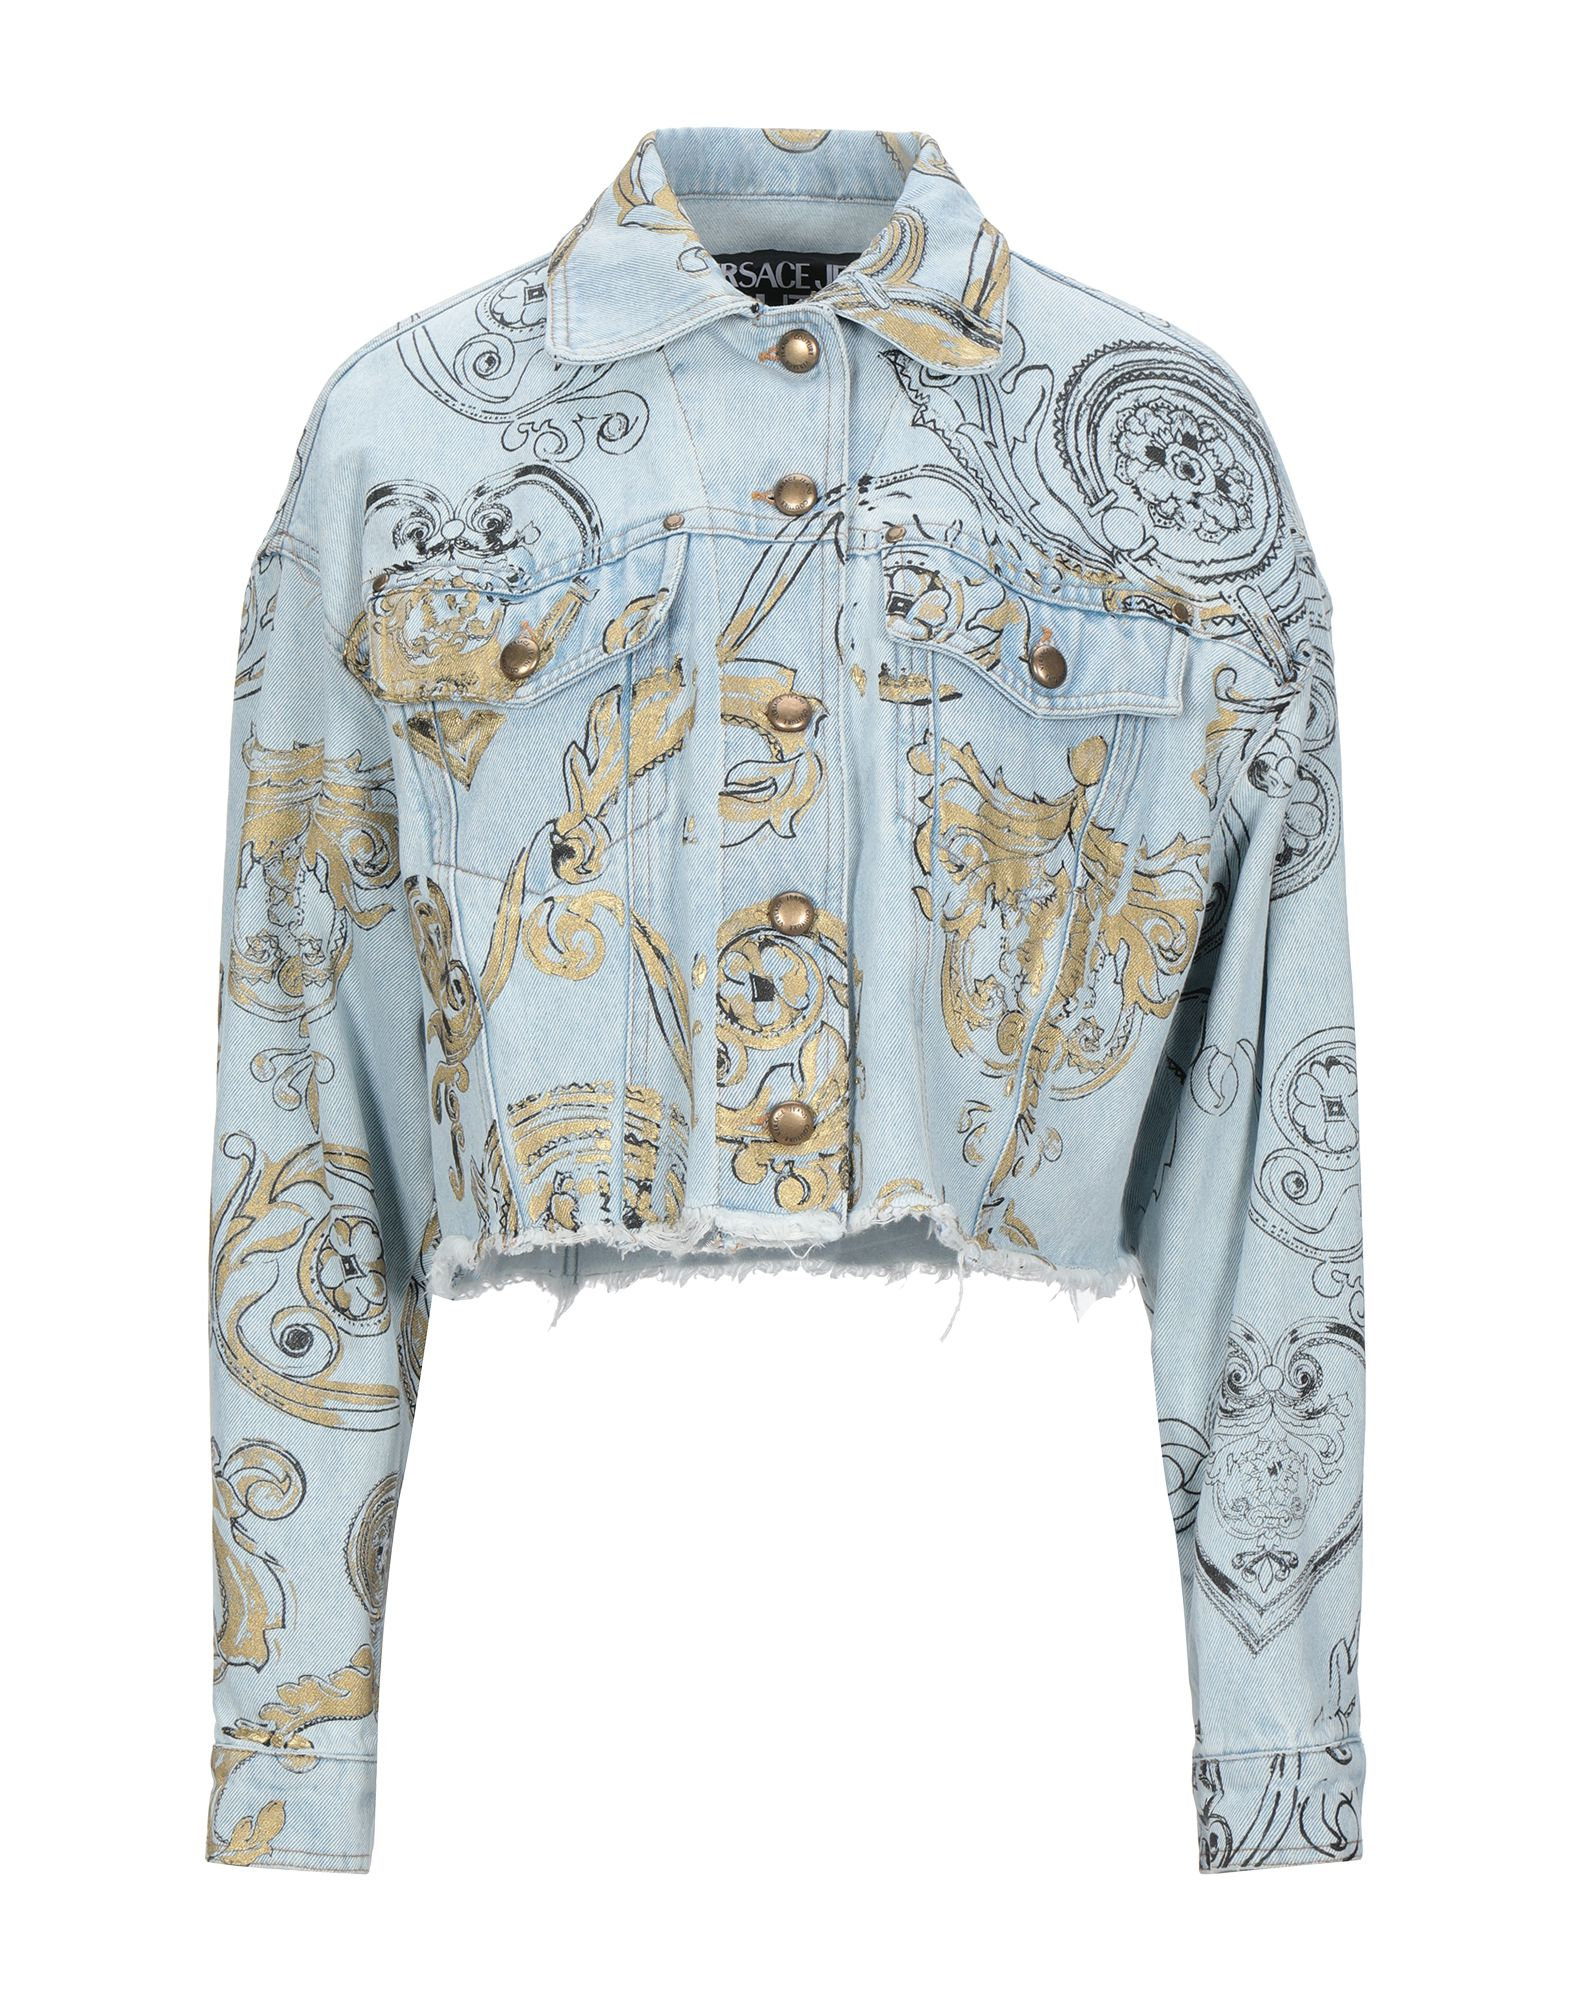 VERSACE JEANS COUTURE Denim outerwear - Item 42815601